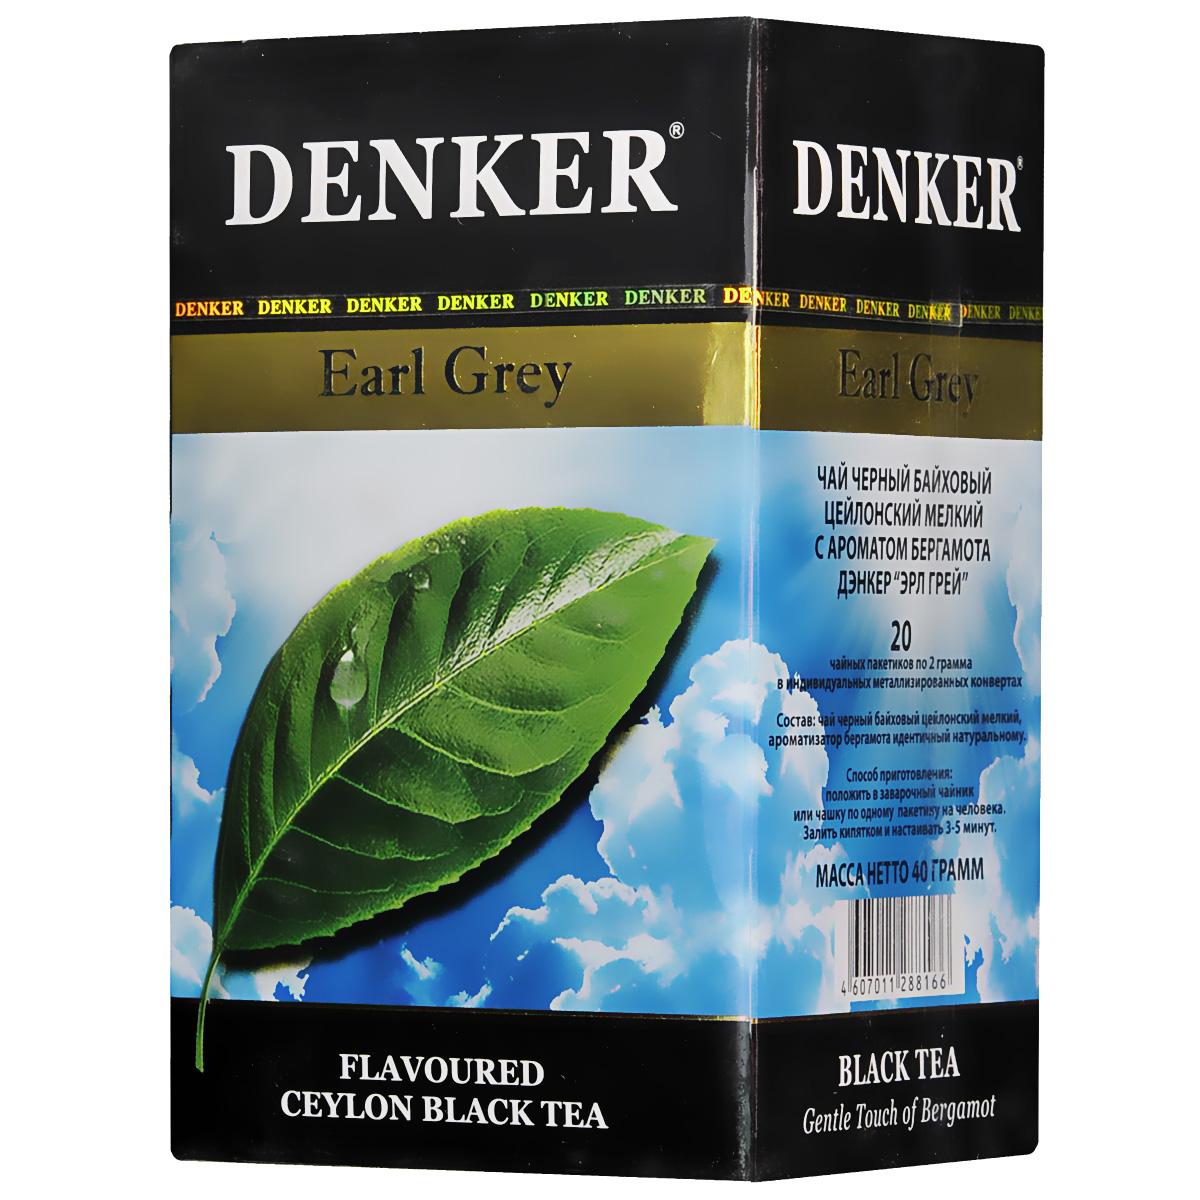 Denker Earl Greyчерный ароматизированный чай в пакетиках 20 шт Denker